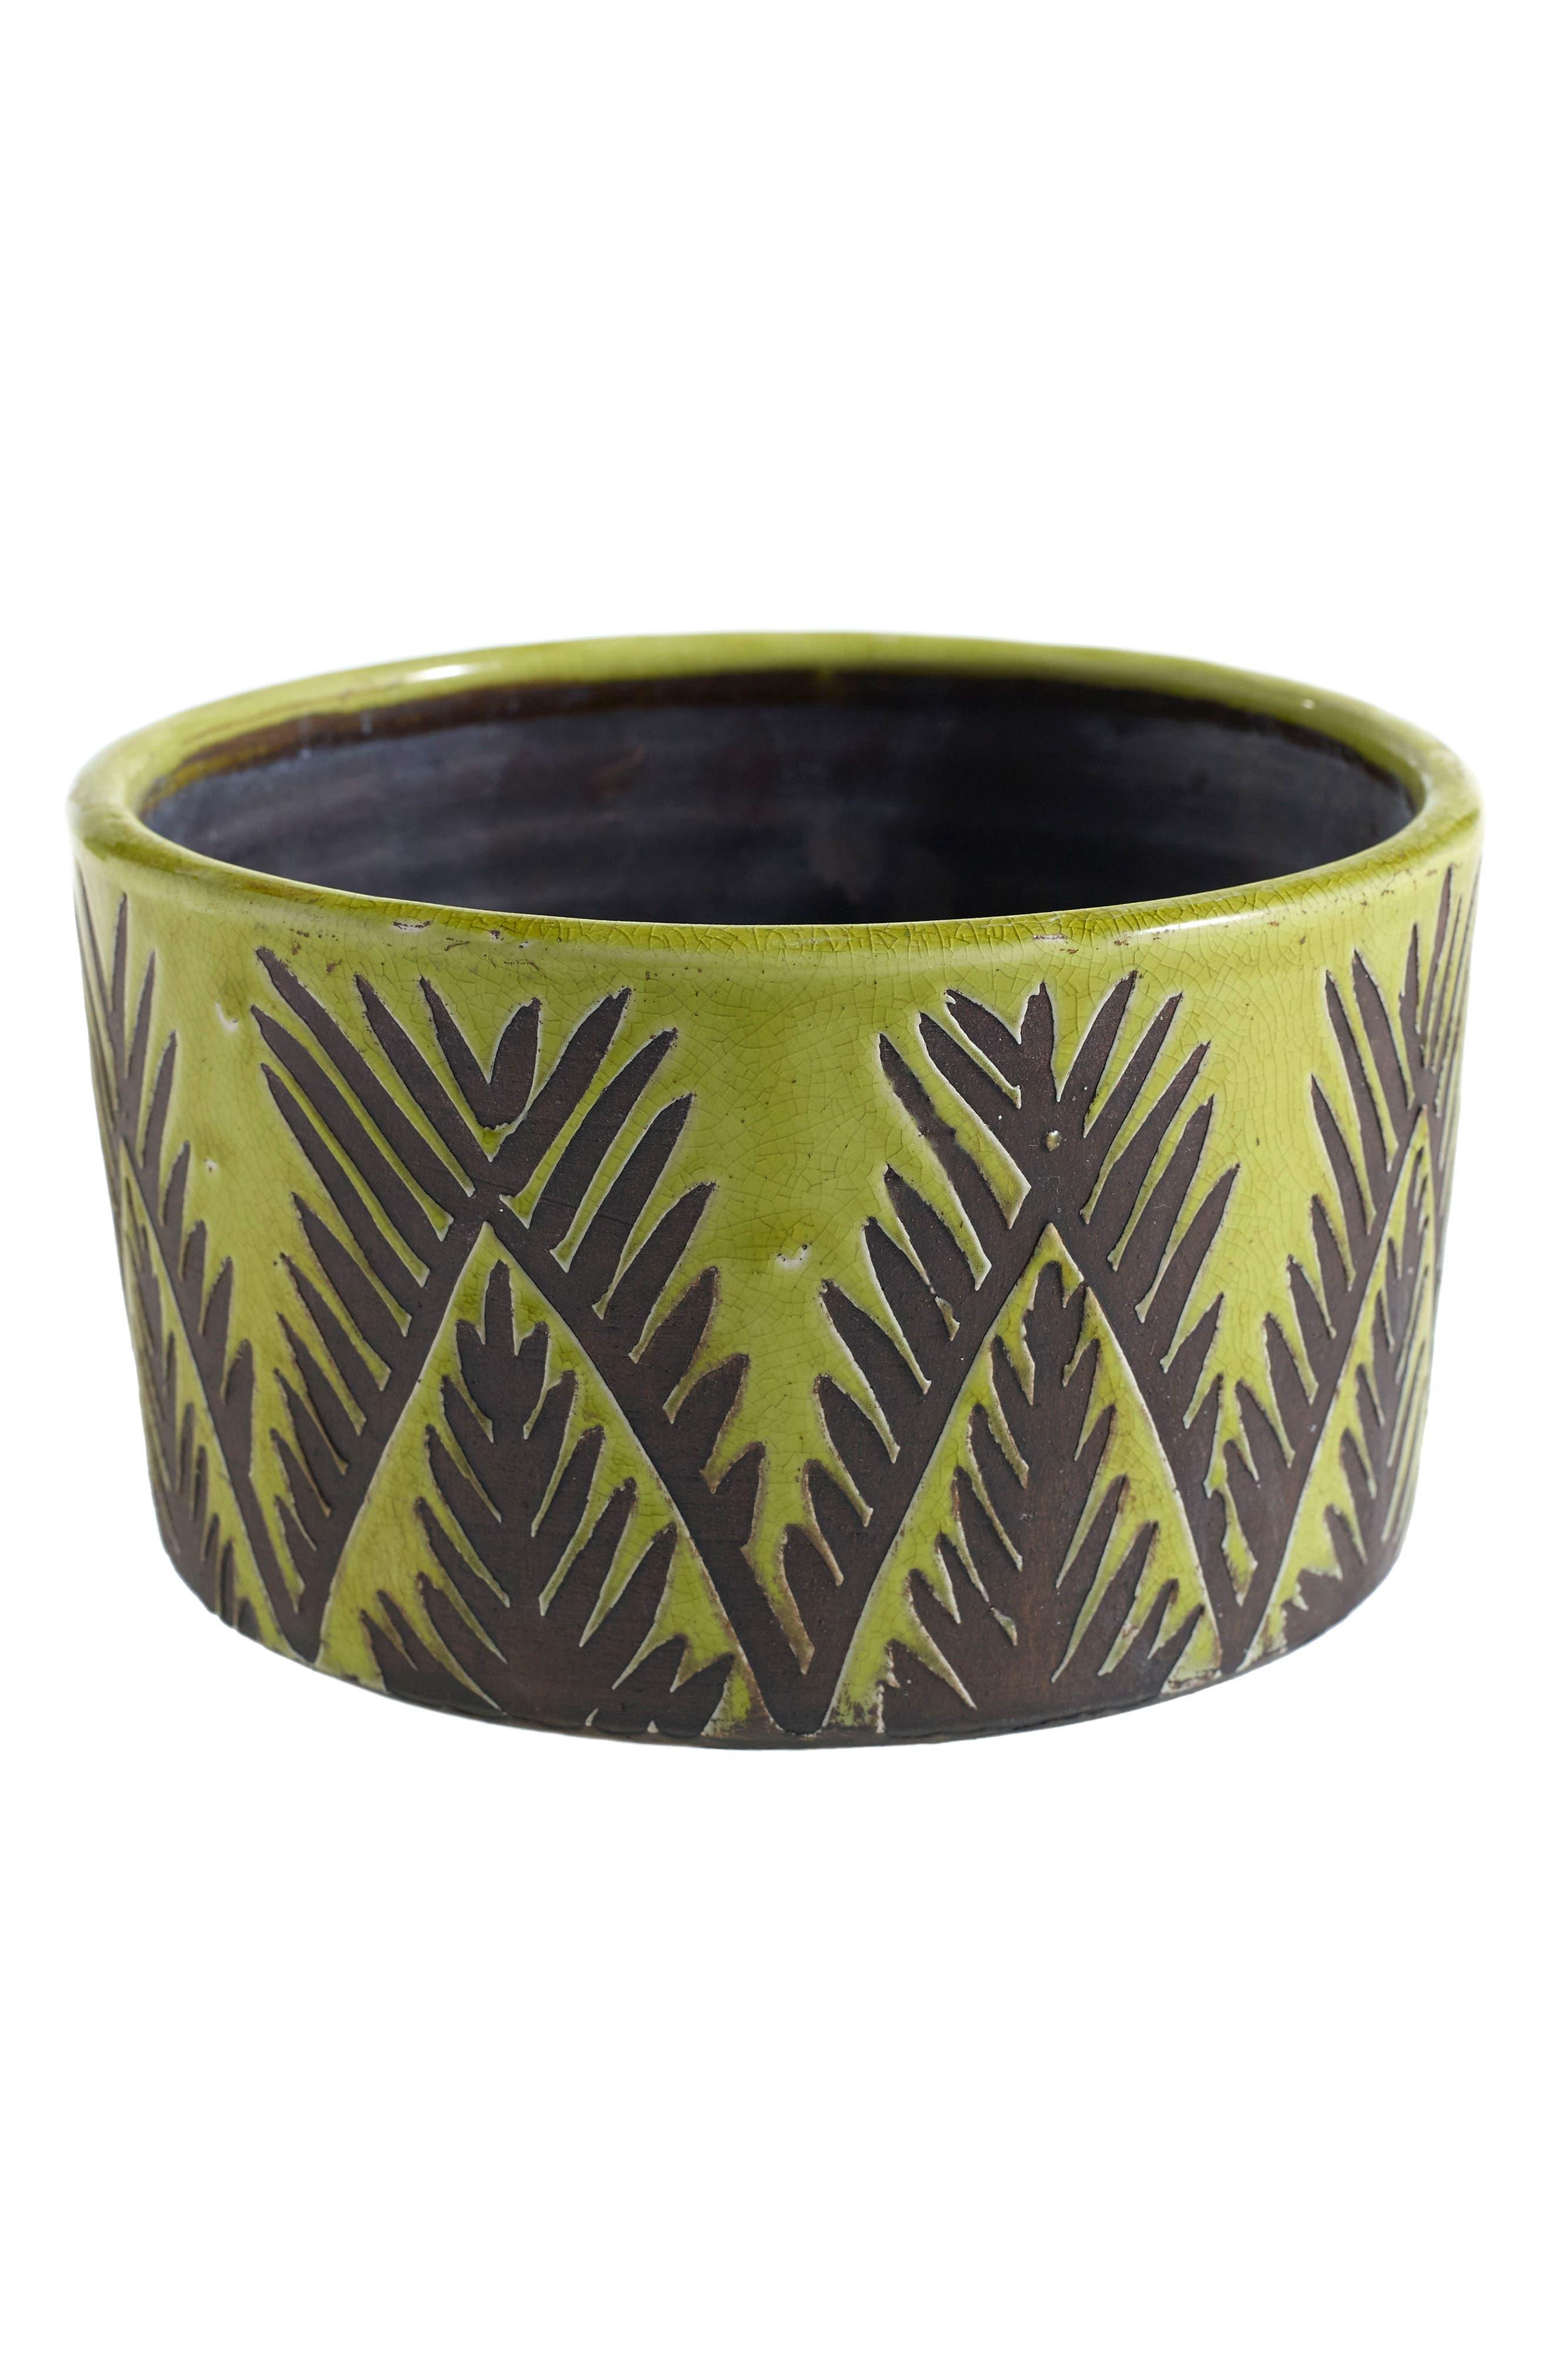 Manga Ceramic Bowl,                             Main thumbnail 1, color,                             Green